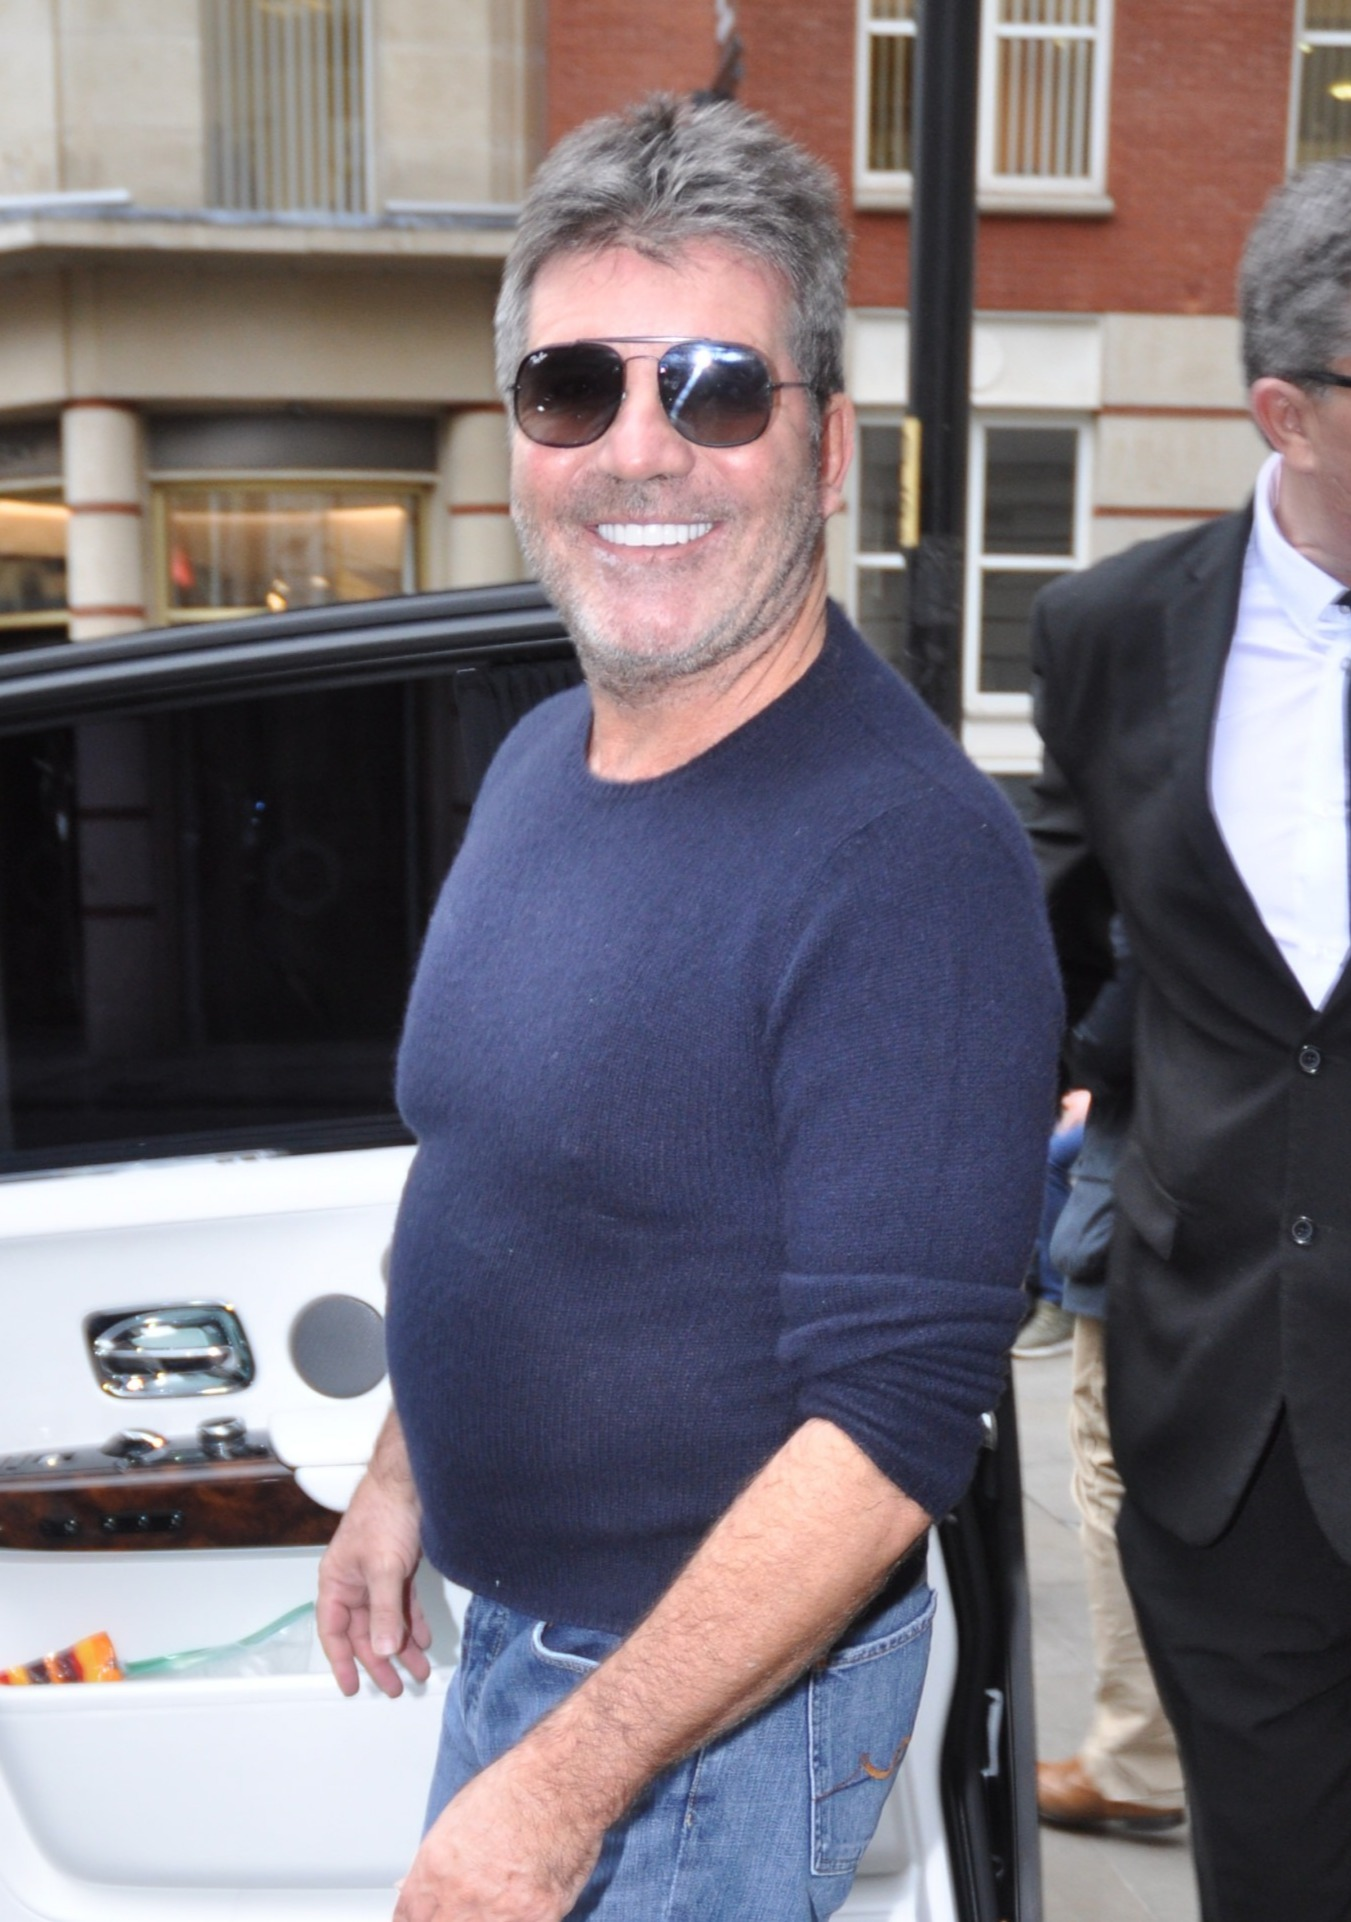 Simon Cowell Leaving Hotel Gotham Manchester